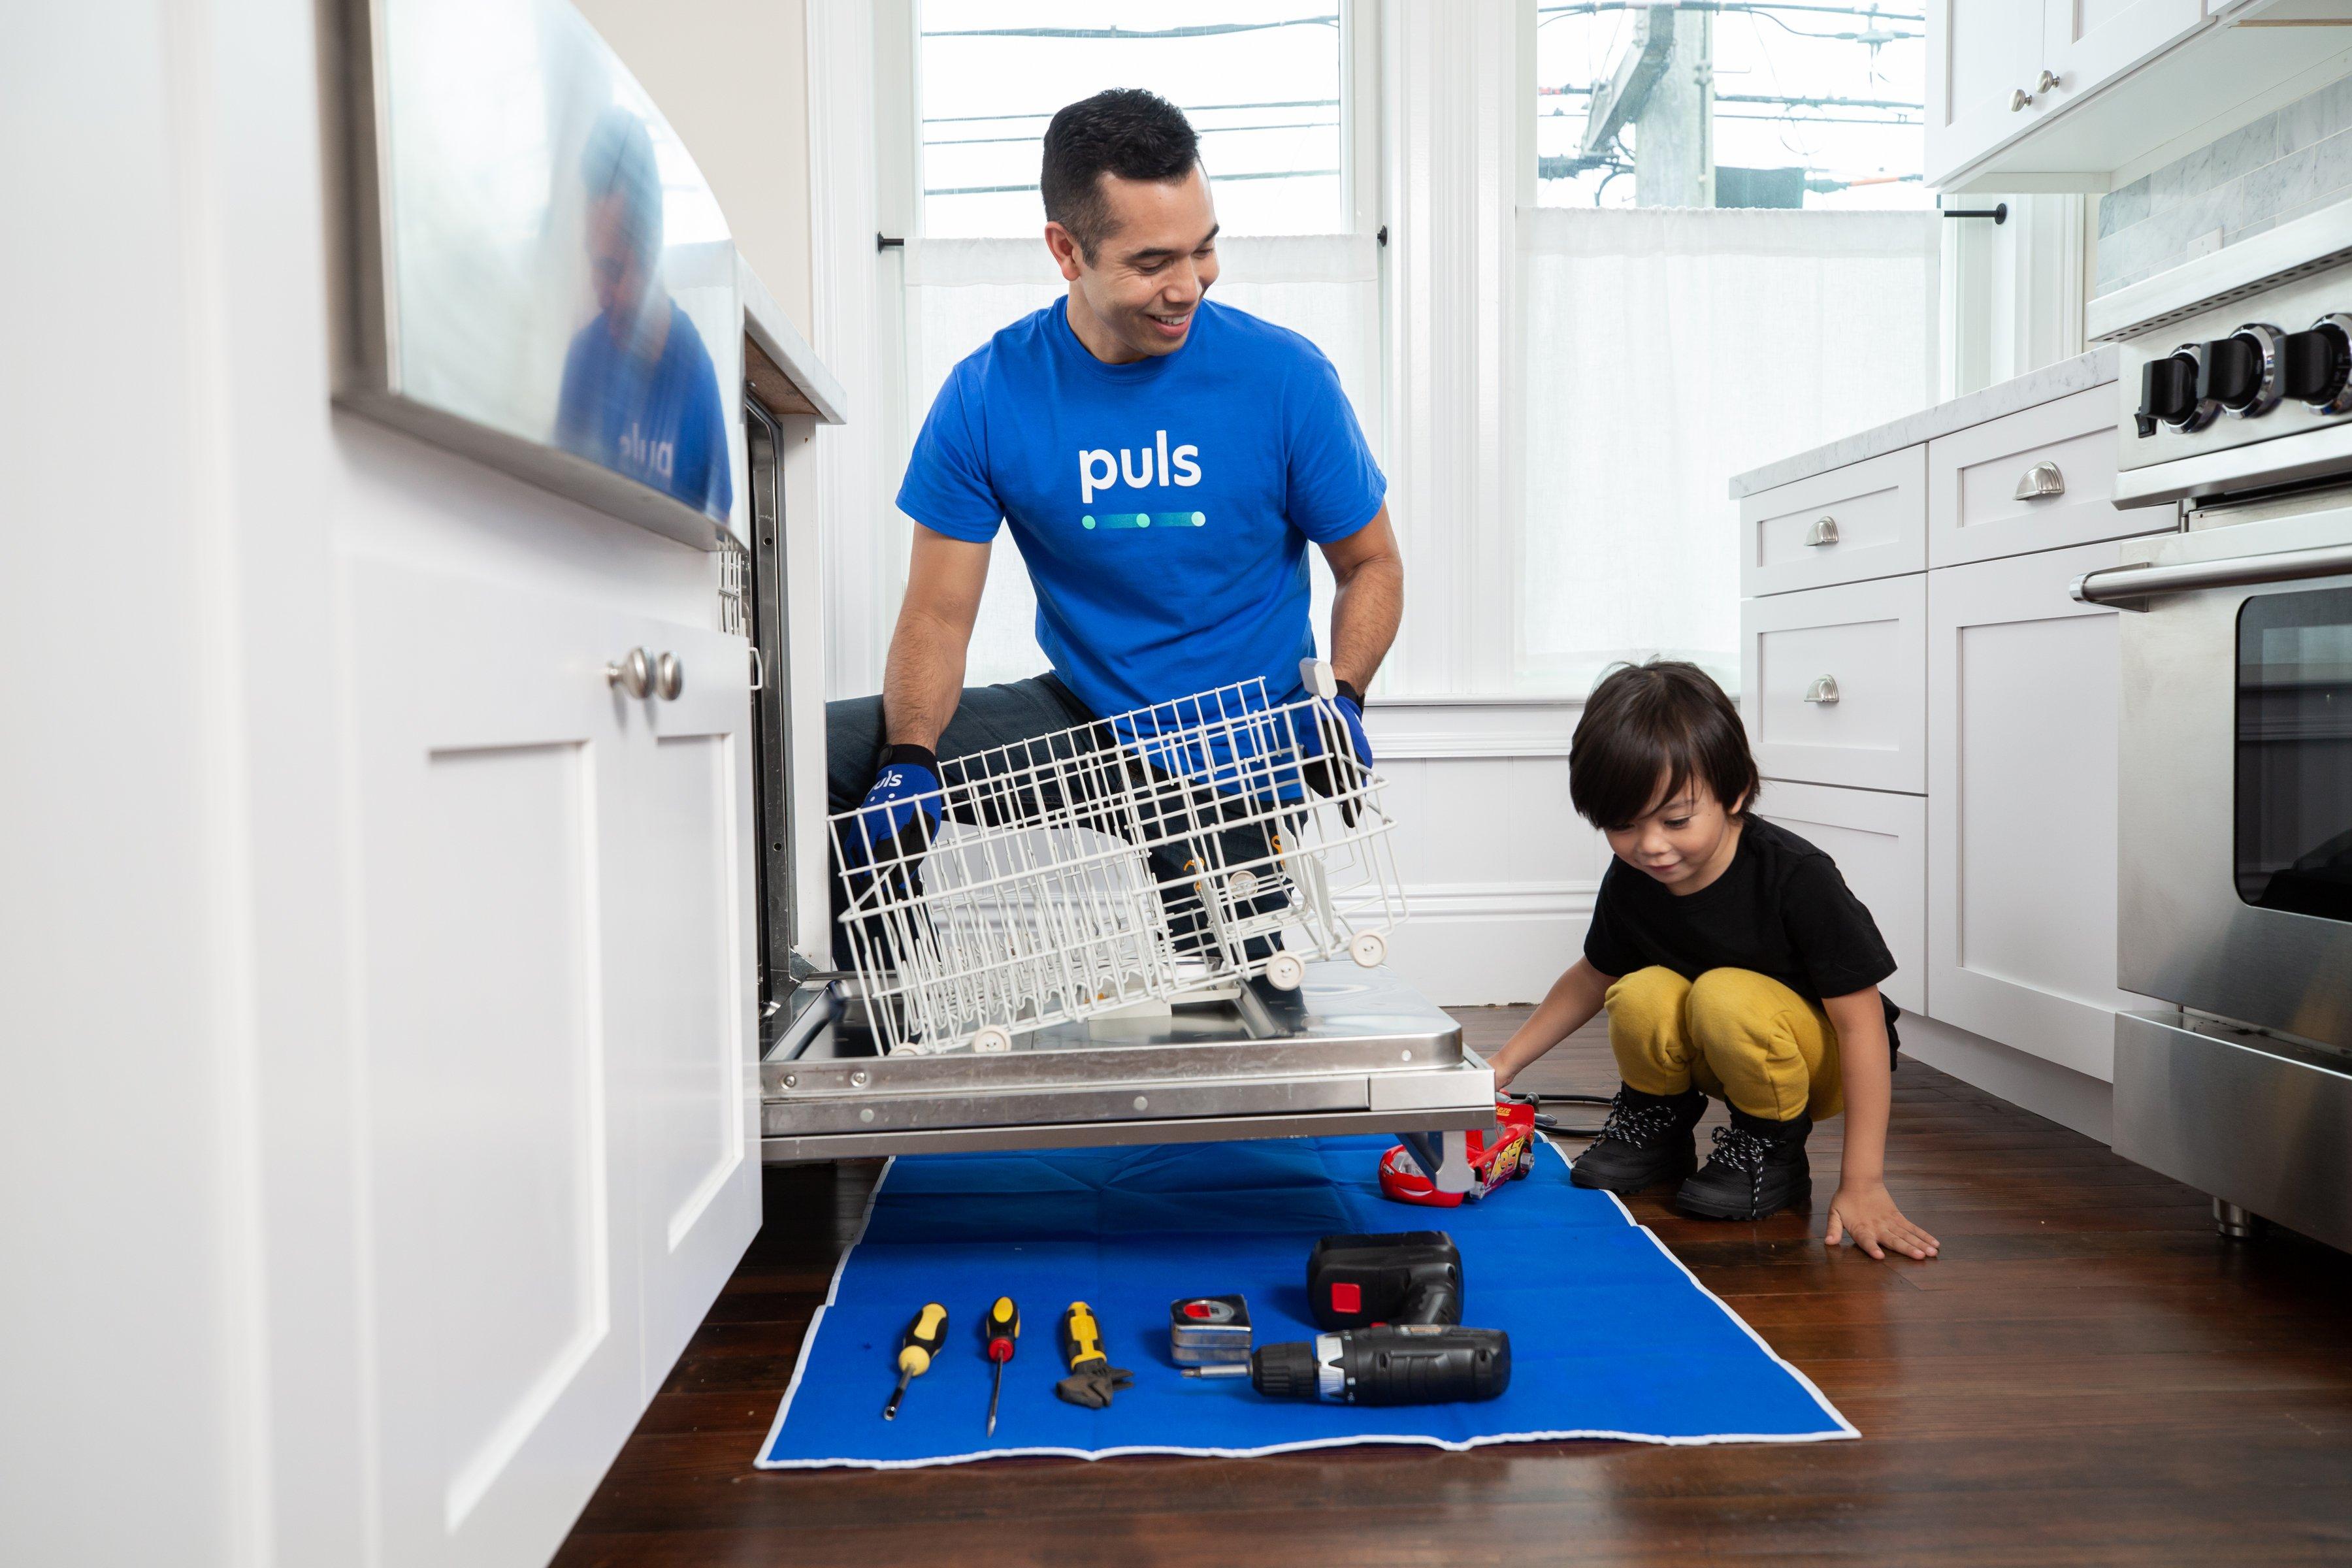 Puls dishwasher repair technician